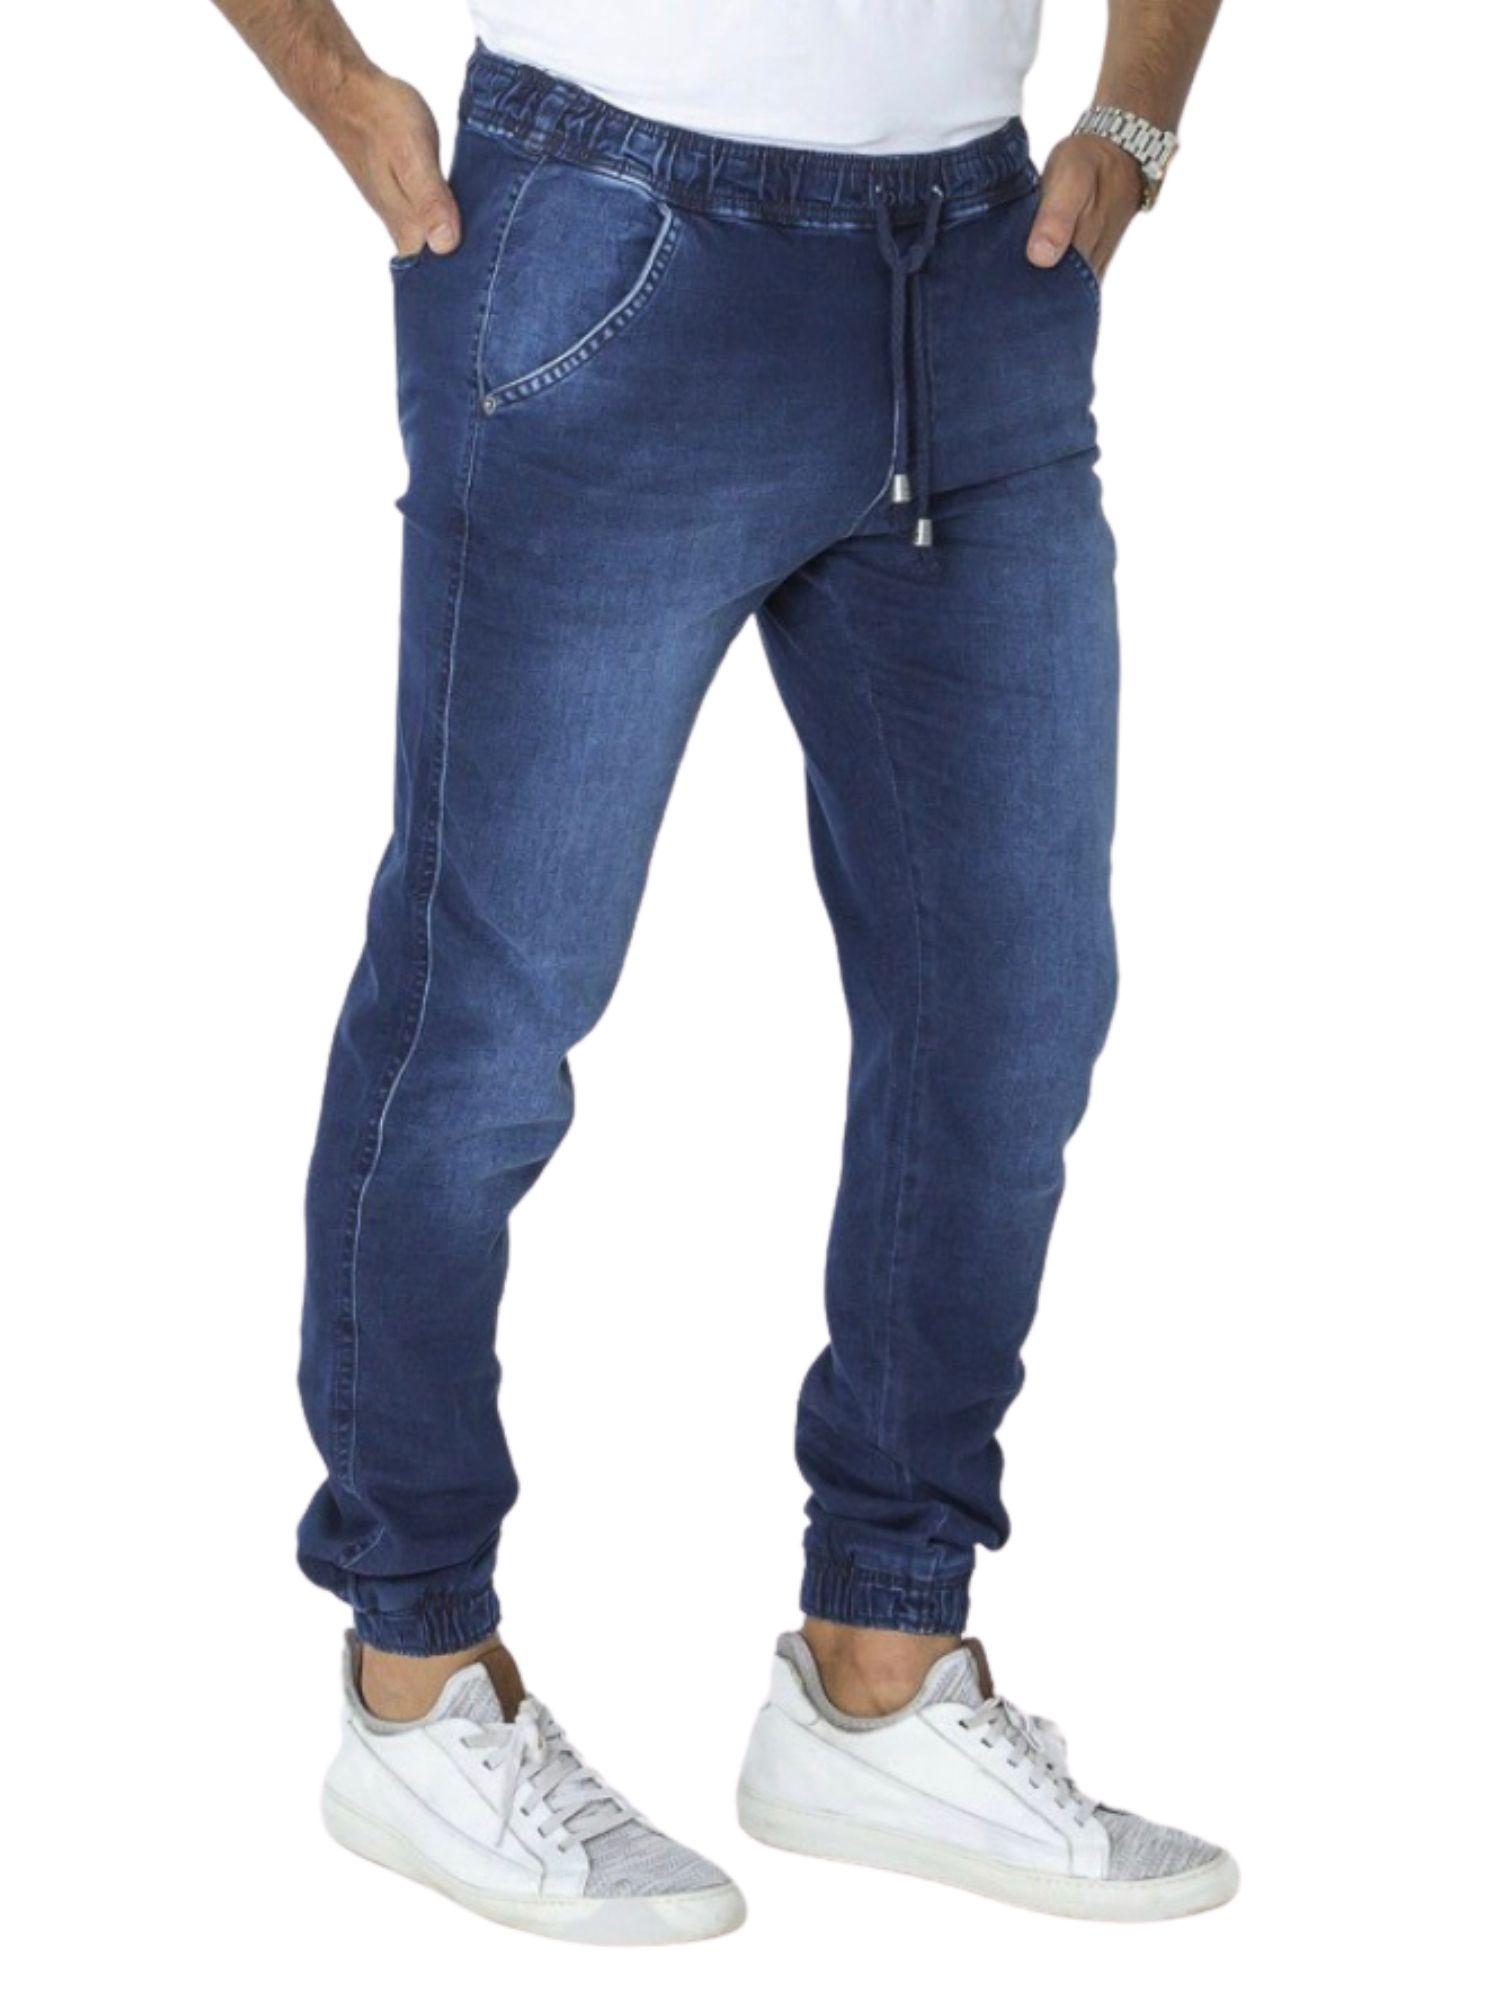 Calça Masculina Jogging Tnw Jeans 91715